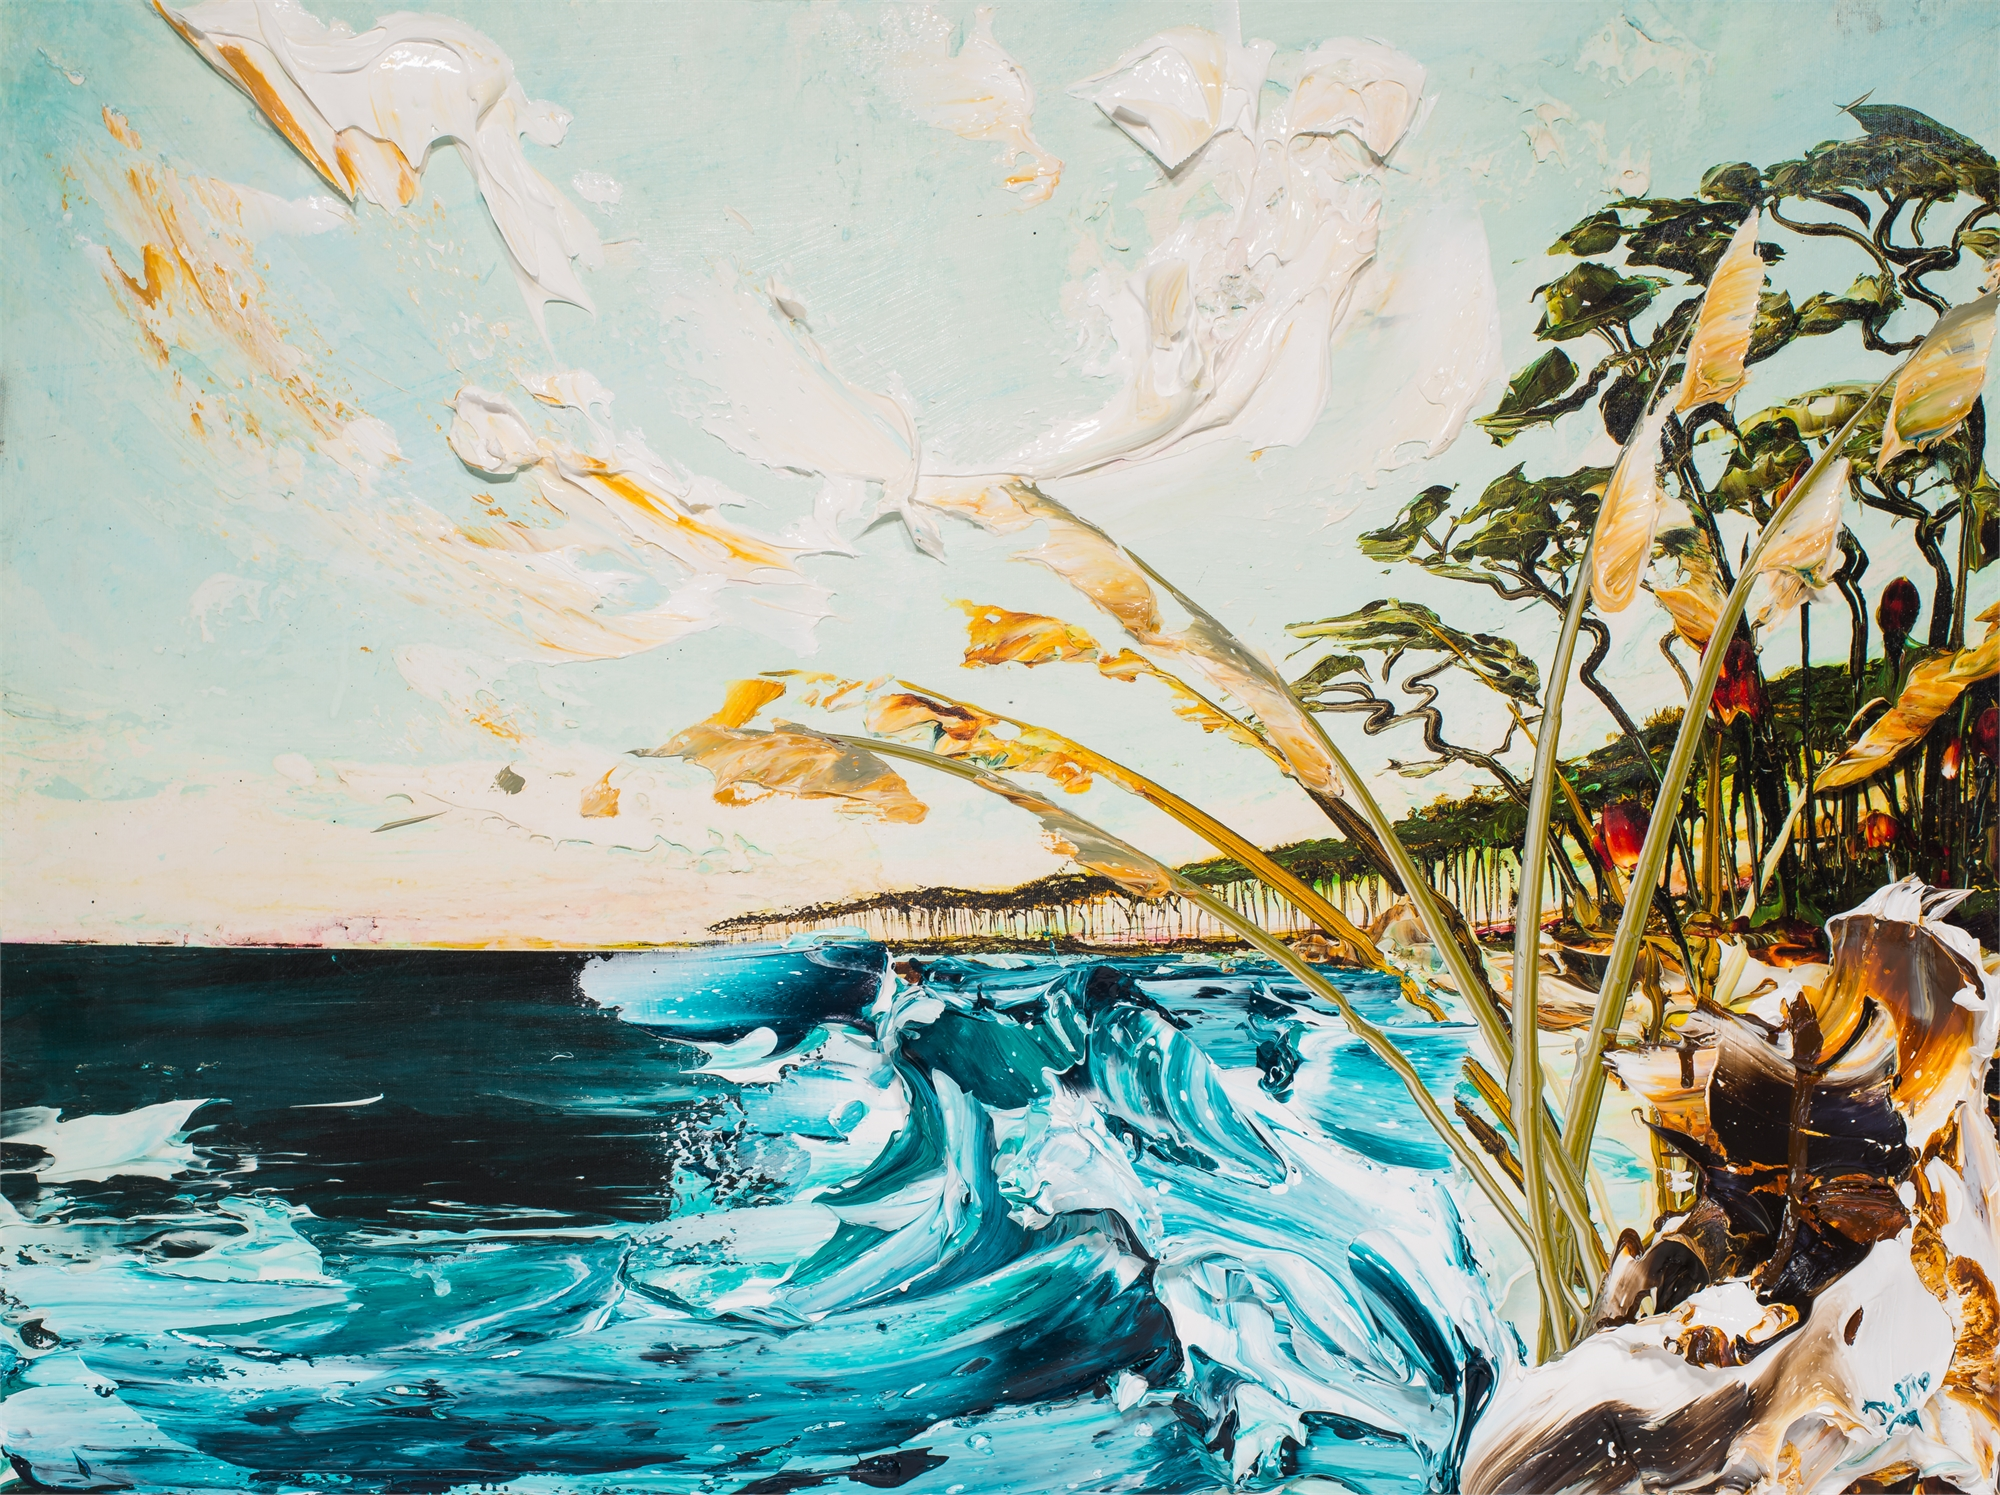 SEASCAPE HPAE 13/50 by Justin Gaffrey